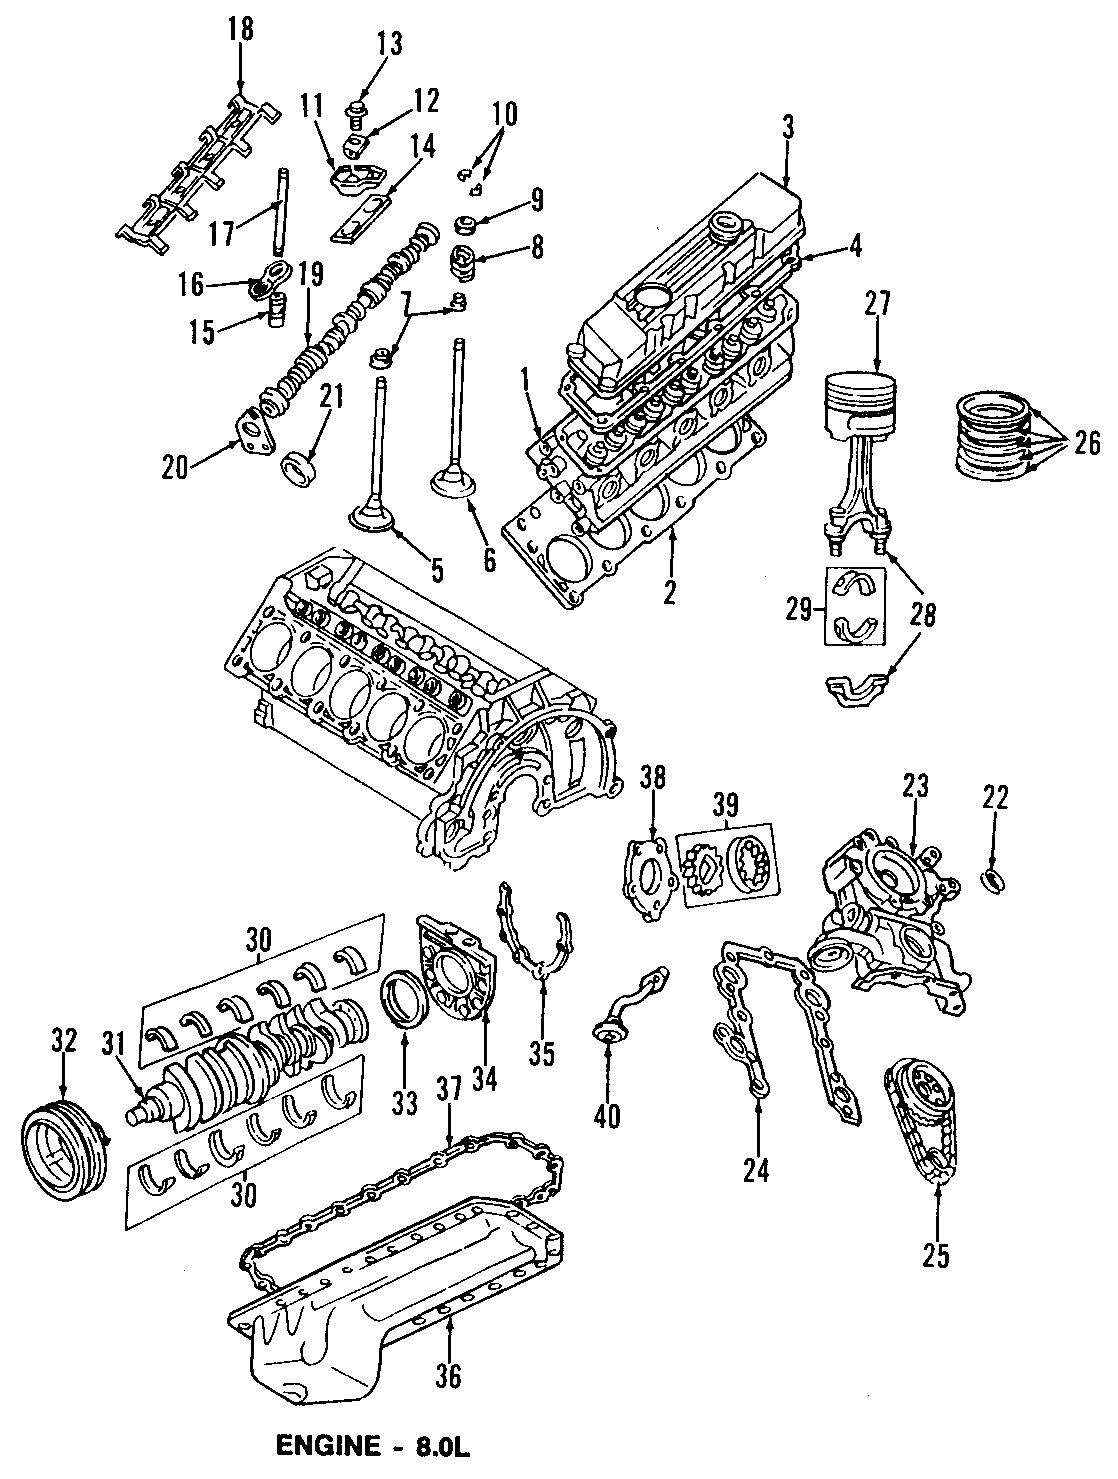 Dodge Ram 2500 Engine Oil Pump Rotor. Ram. Ram 2500, 3500